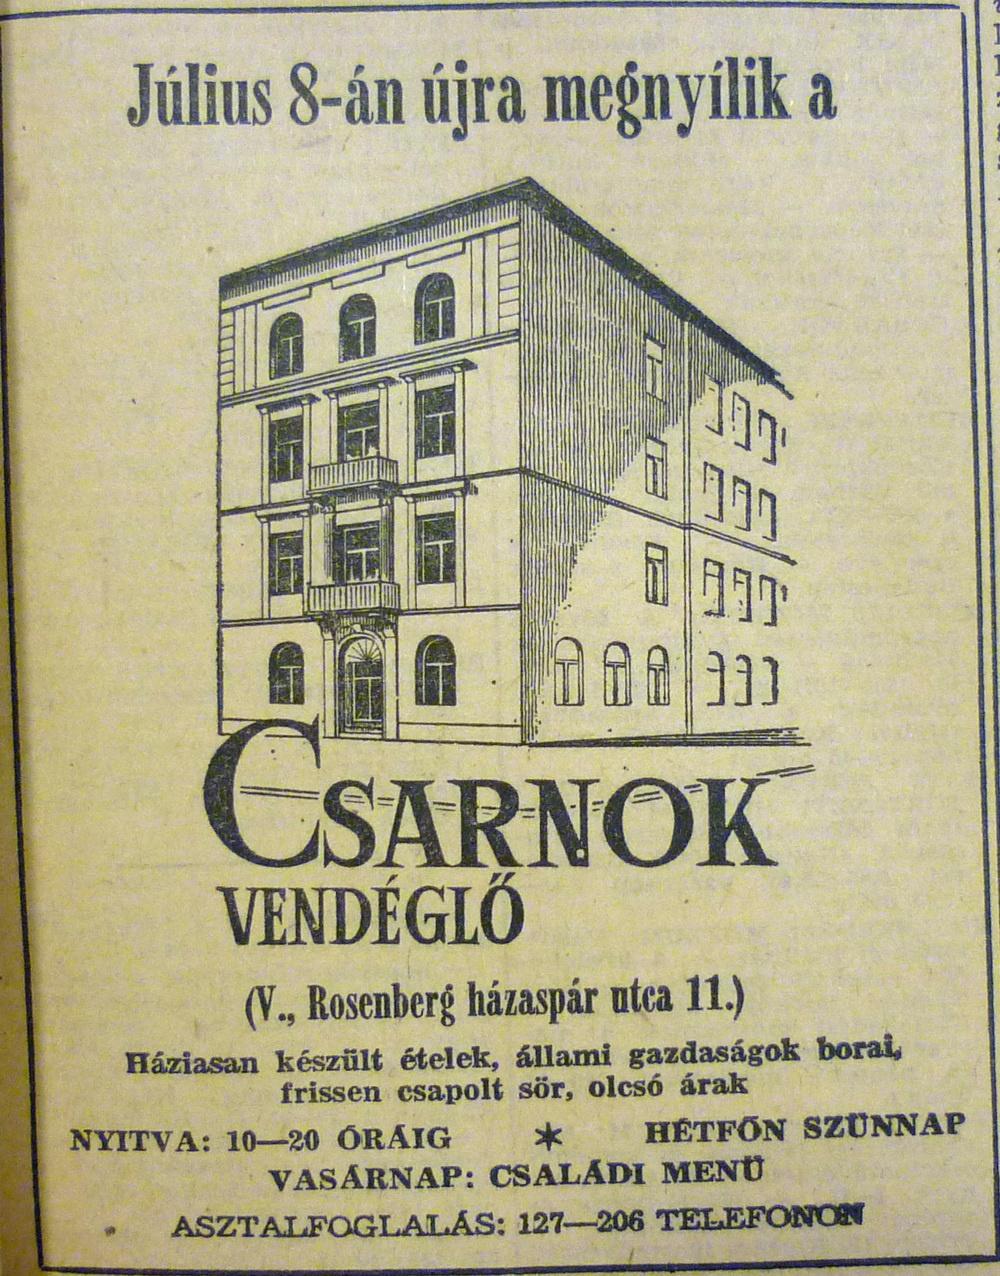 fovarosi.blog.hu: CsarnokVendeglo-19690706-MagyarNemzetHirdetes - indafoto.hu